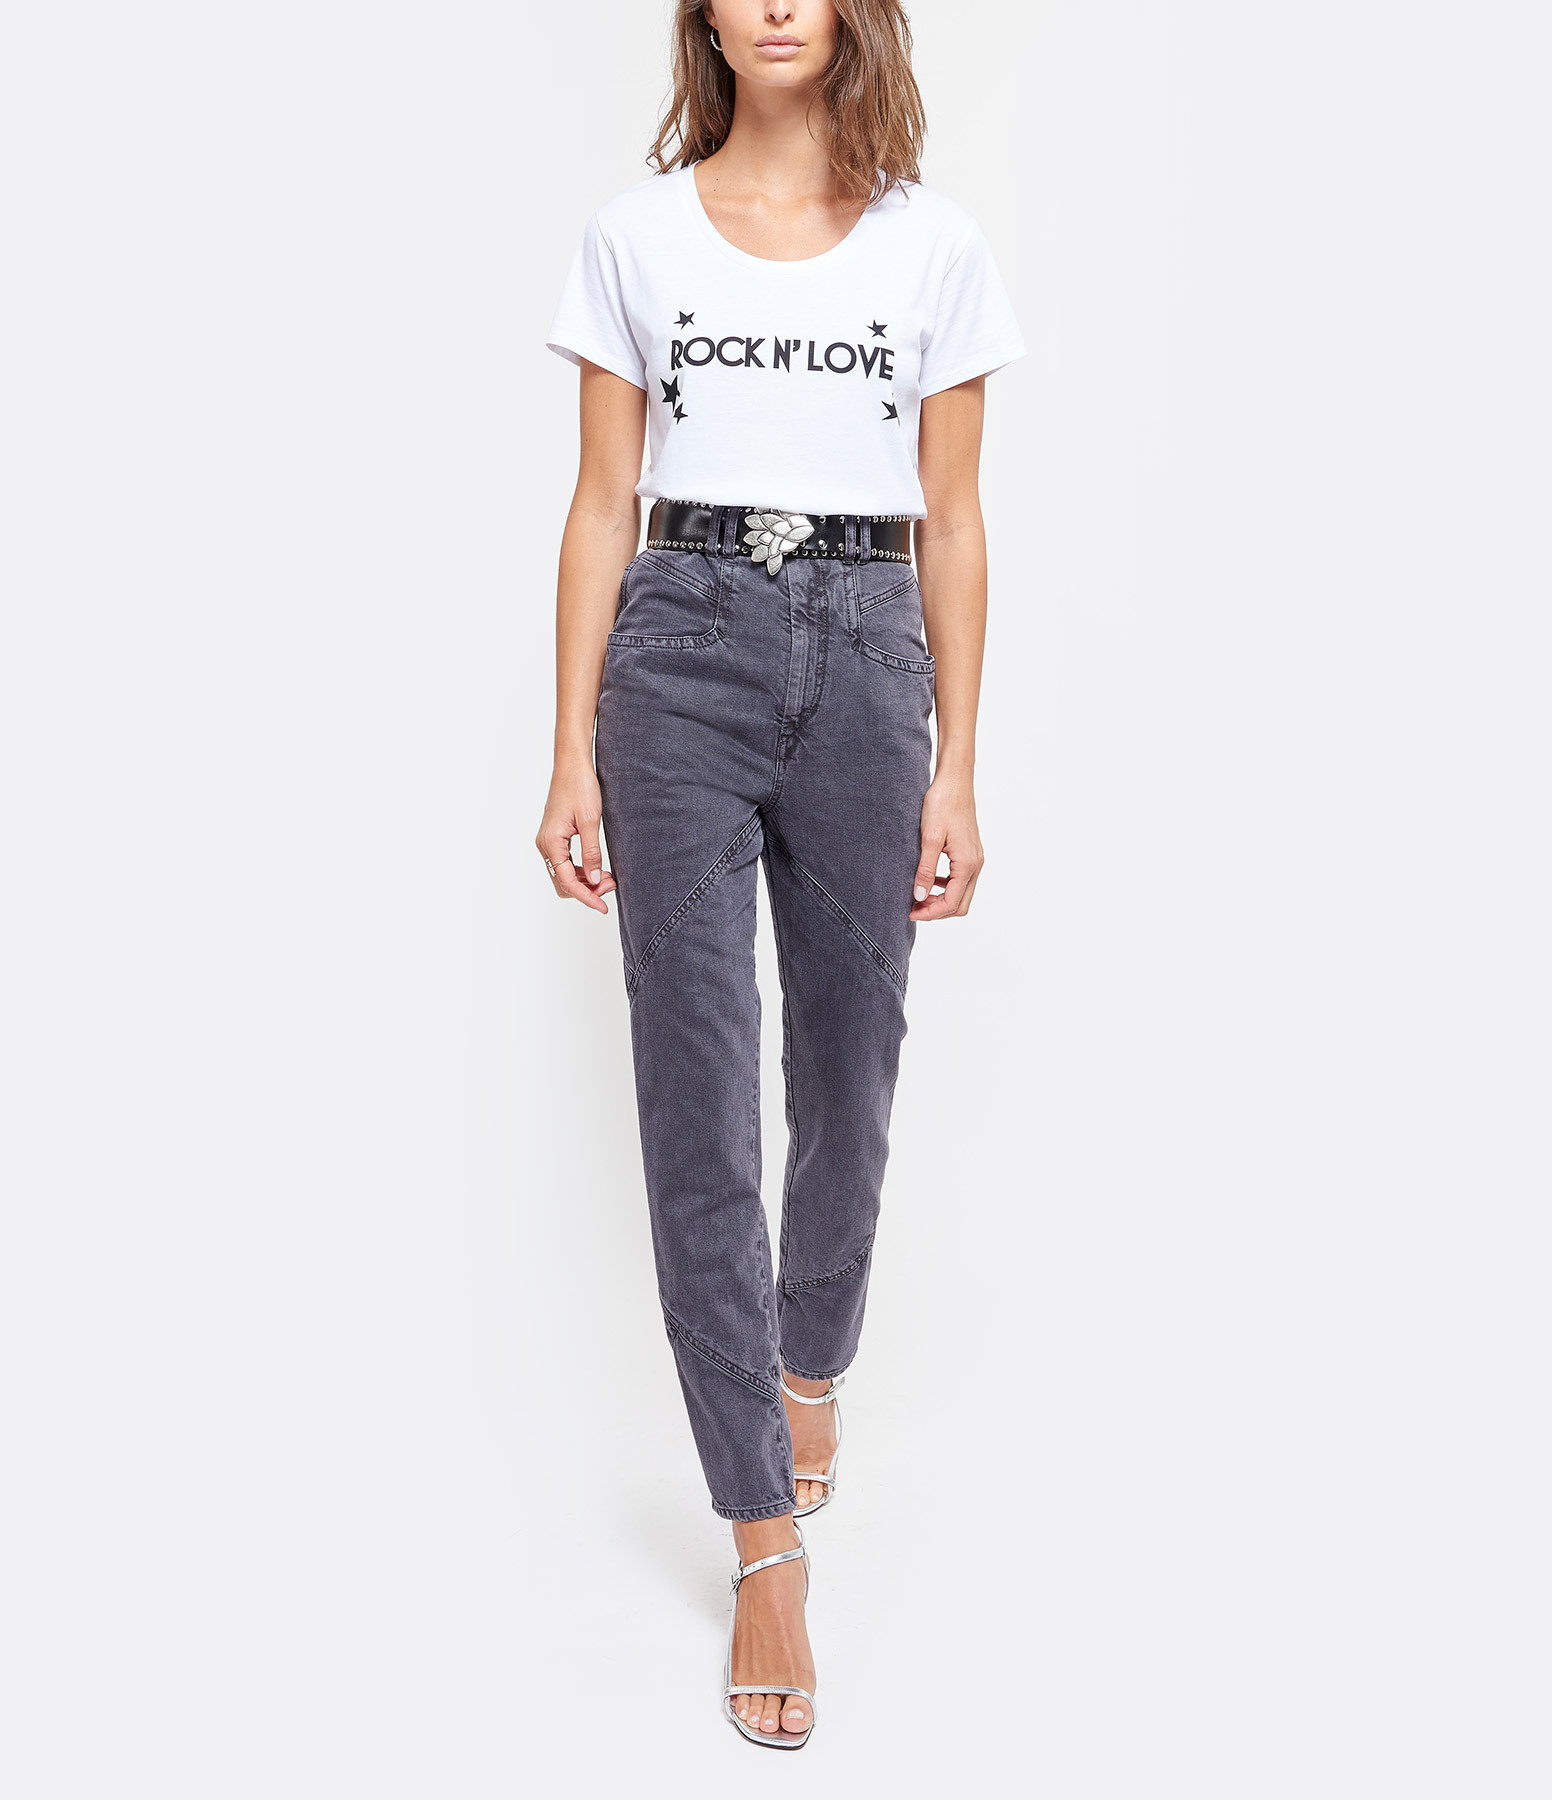 JEANNE VOULAND - Tee-shirt Eder Rock n' Love Coton Blanc